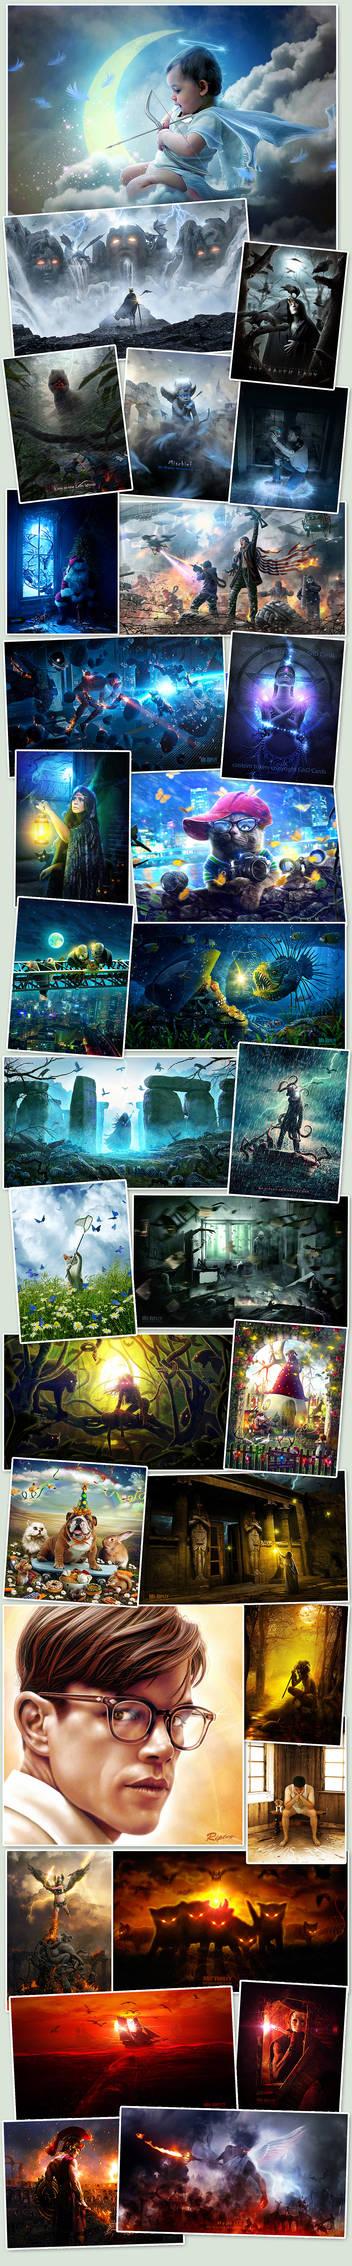 Favorite Works Copy by Mr-Ripley